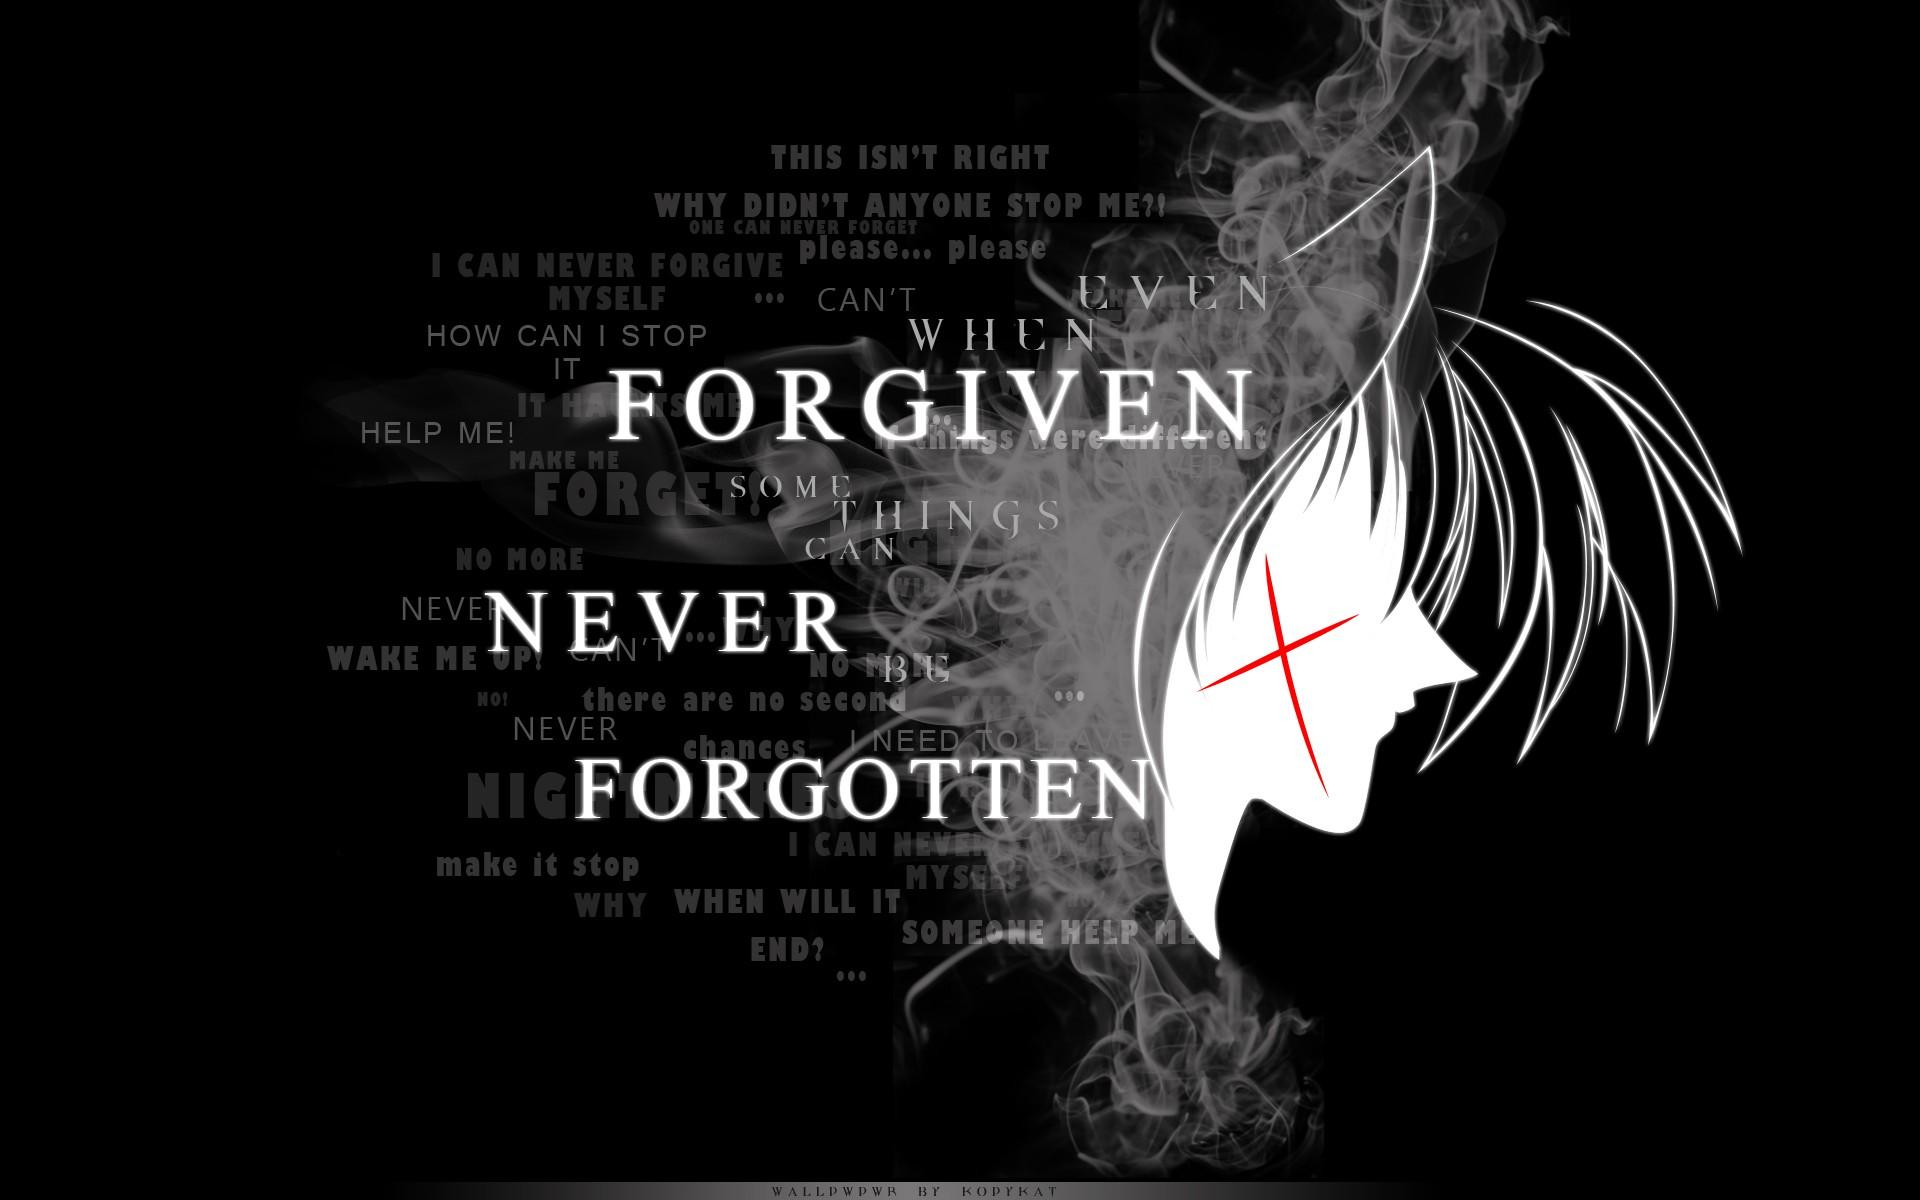 3840x1080 Hd Wallpapers Sad Quote Rurouni Kenshin Hd Wallpaper Background Image